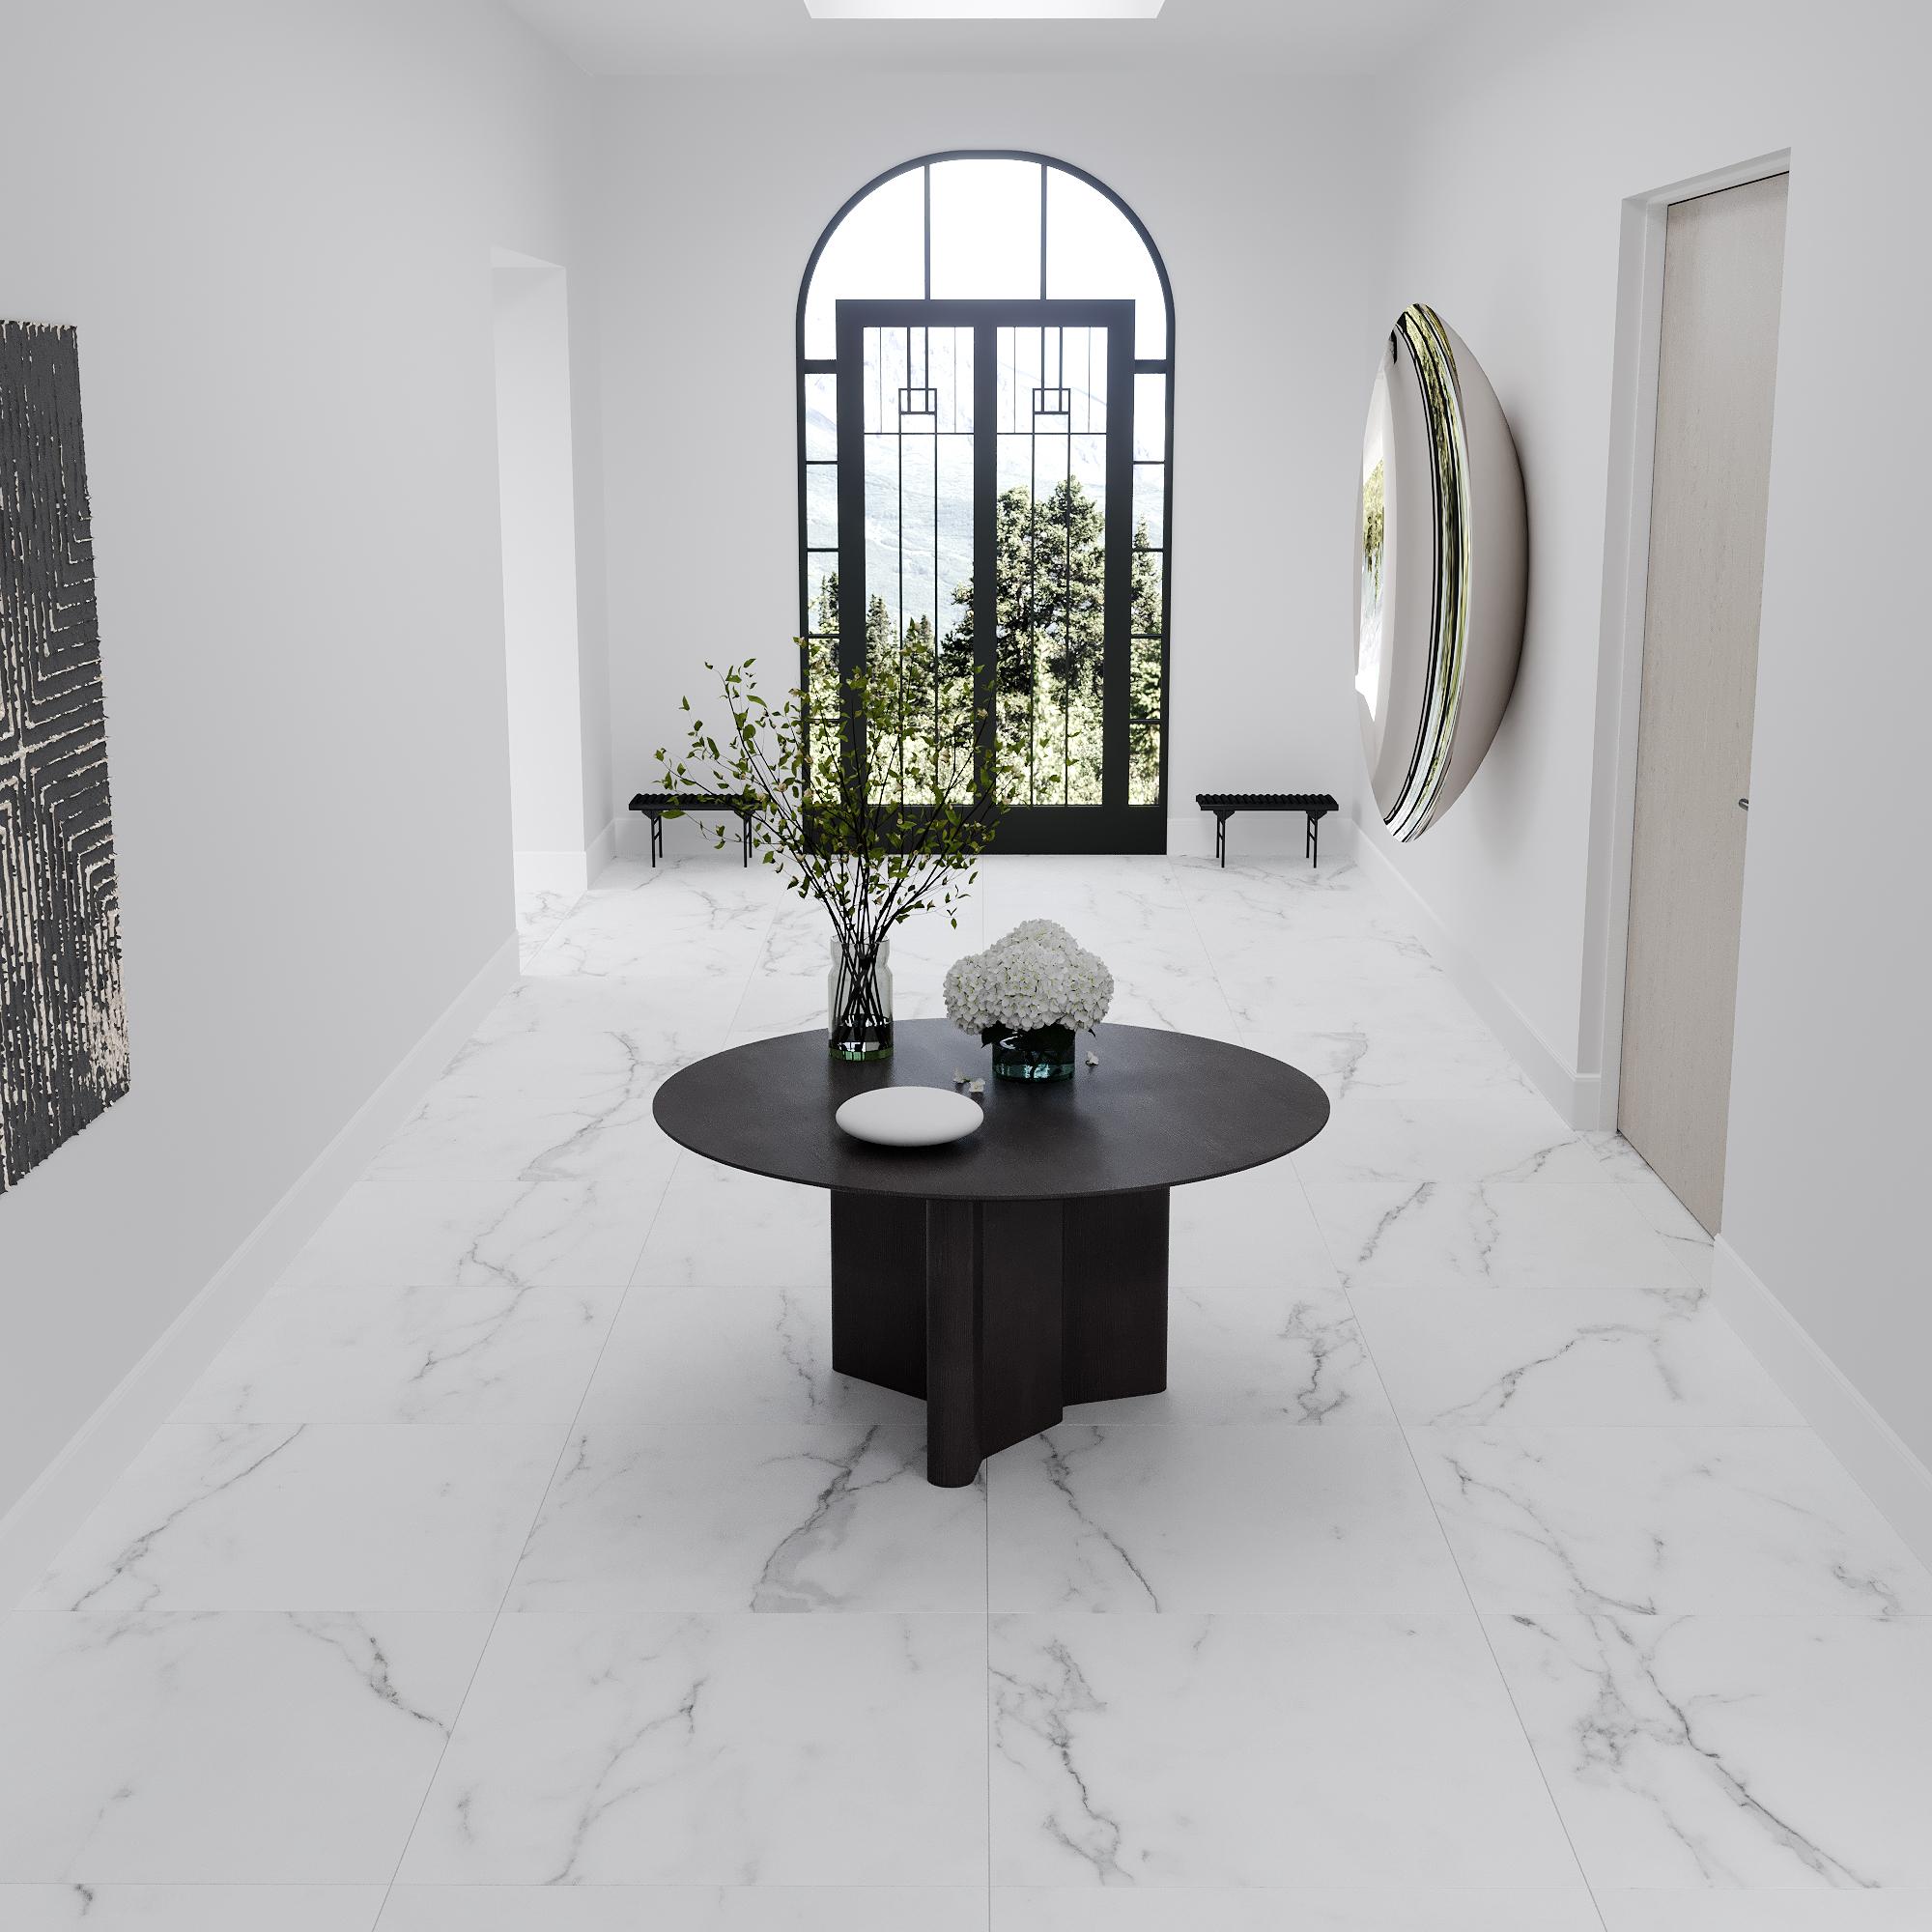 Marmor Klinker Michelangelo Carrara Vit 60x60 cm